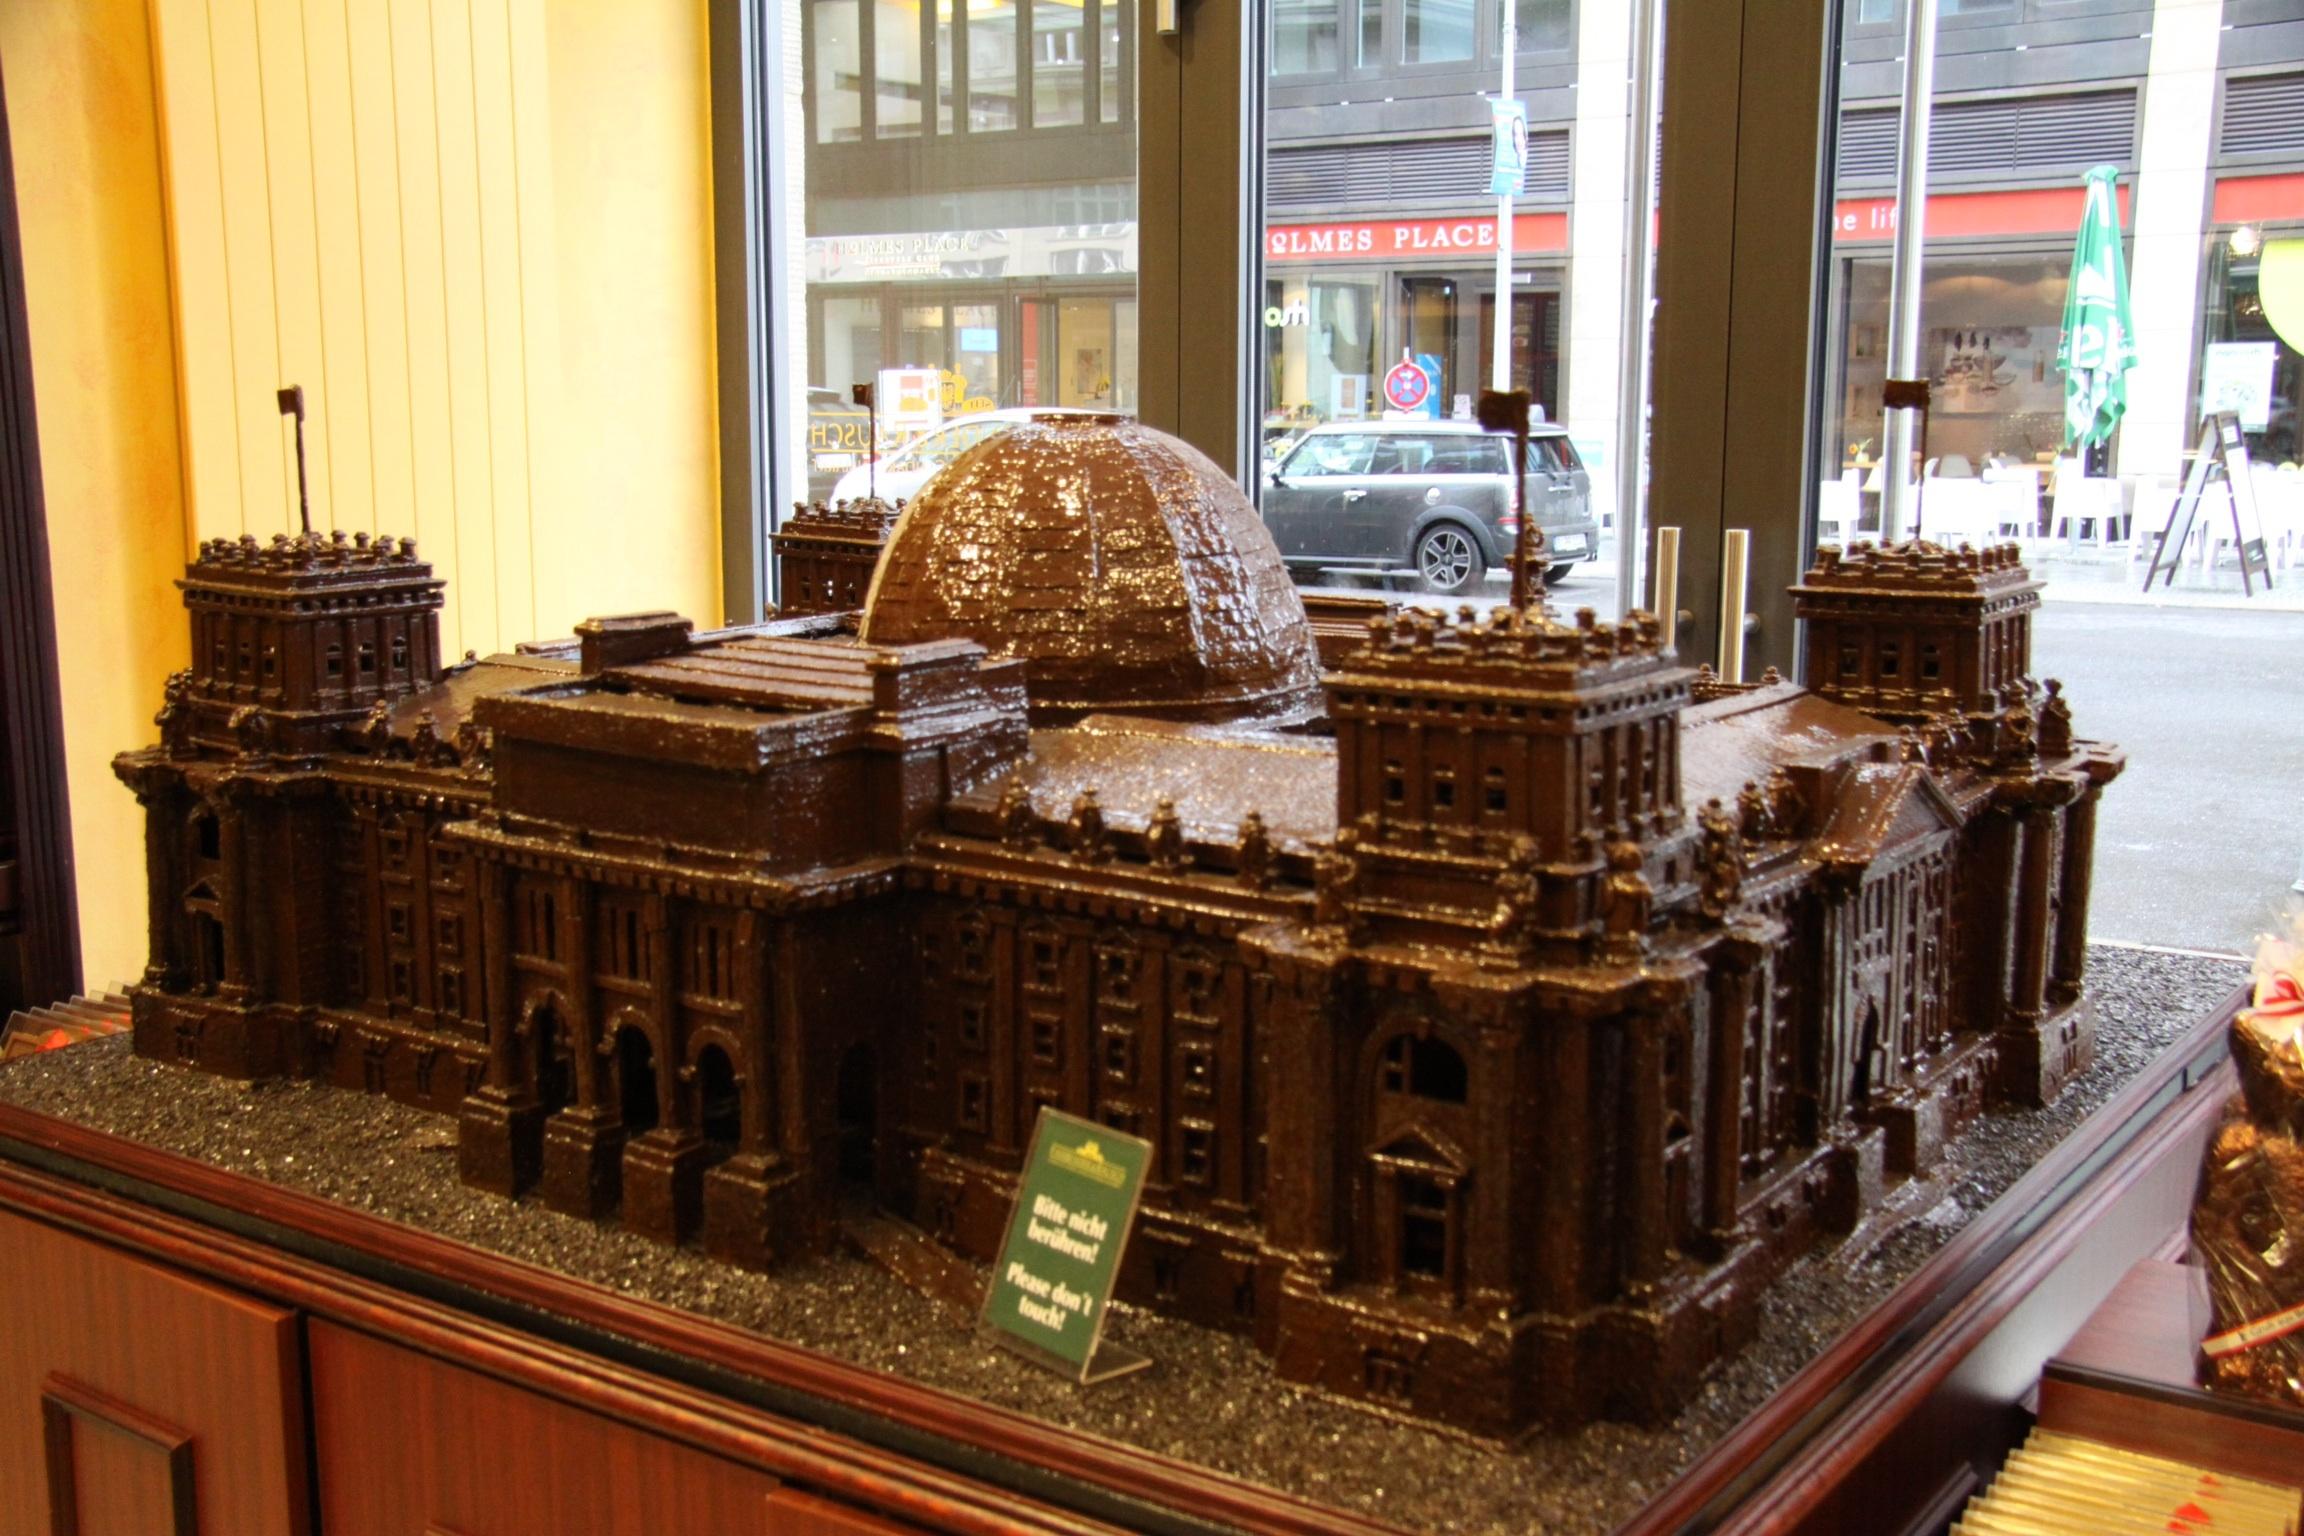 Prince Building Cake Shop